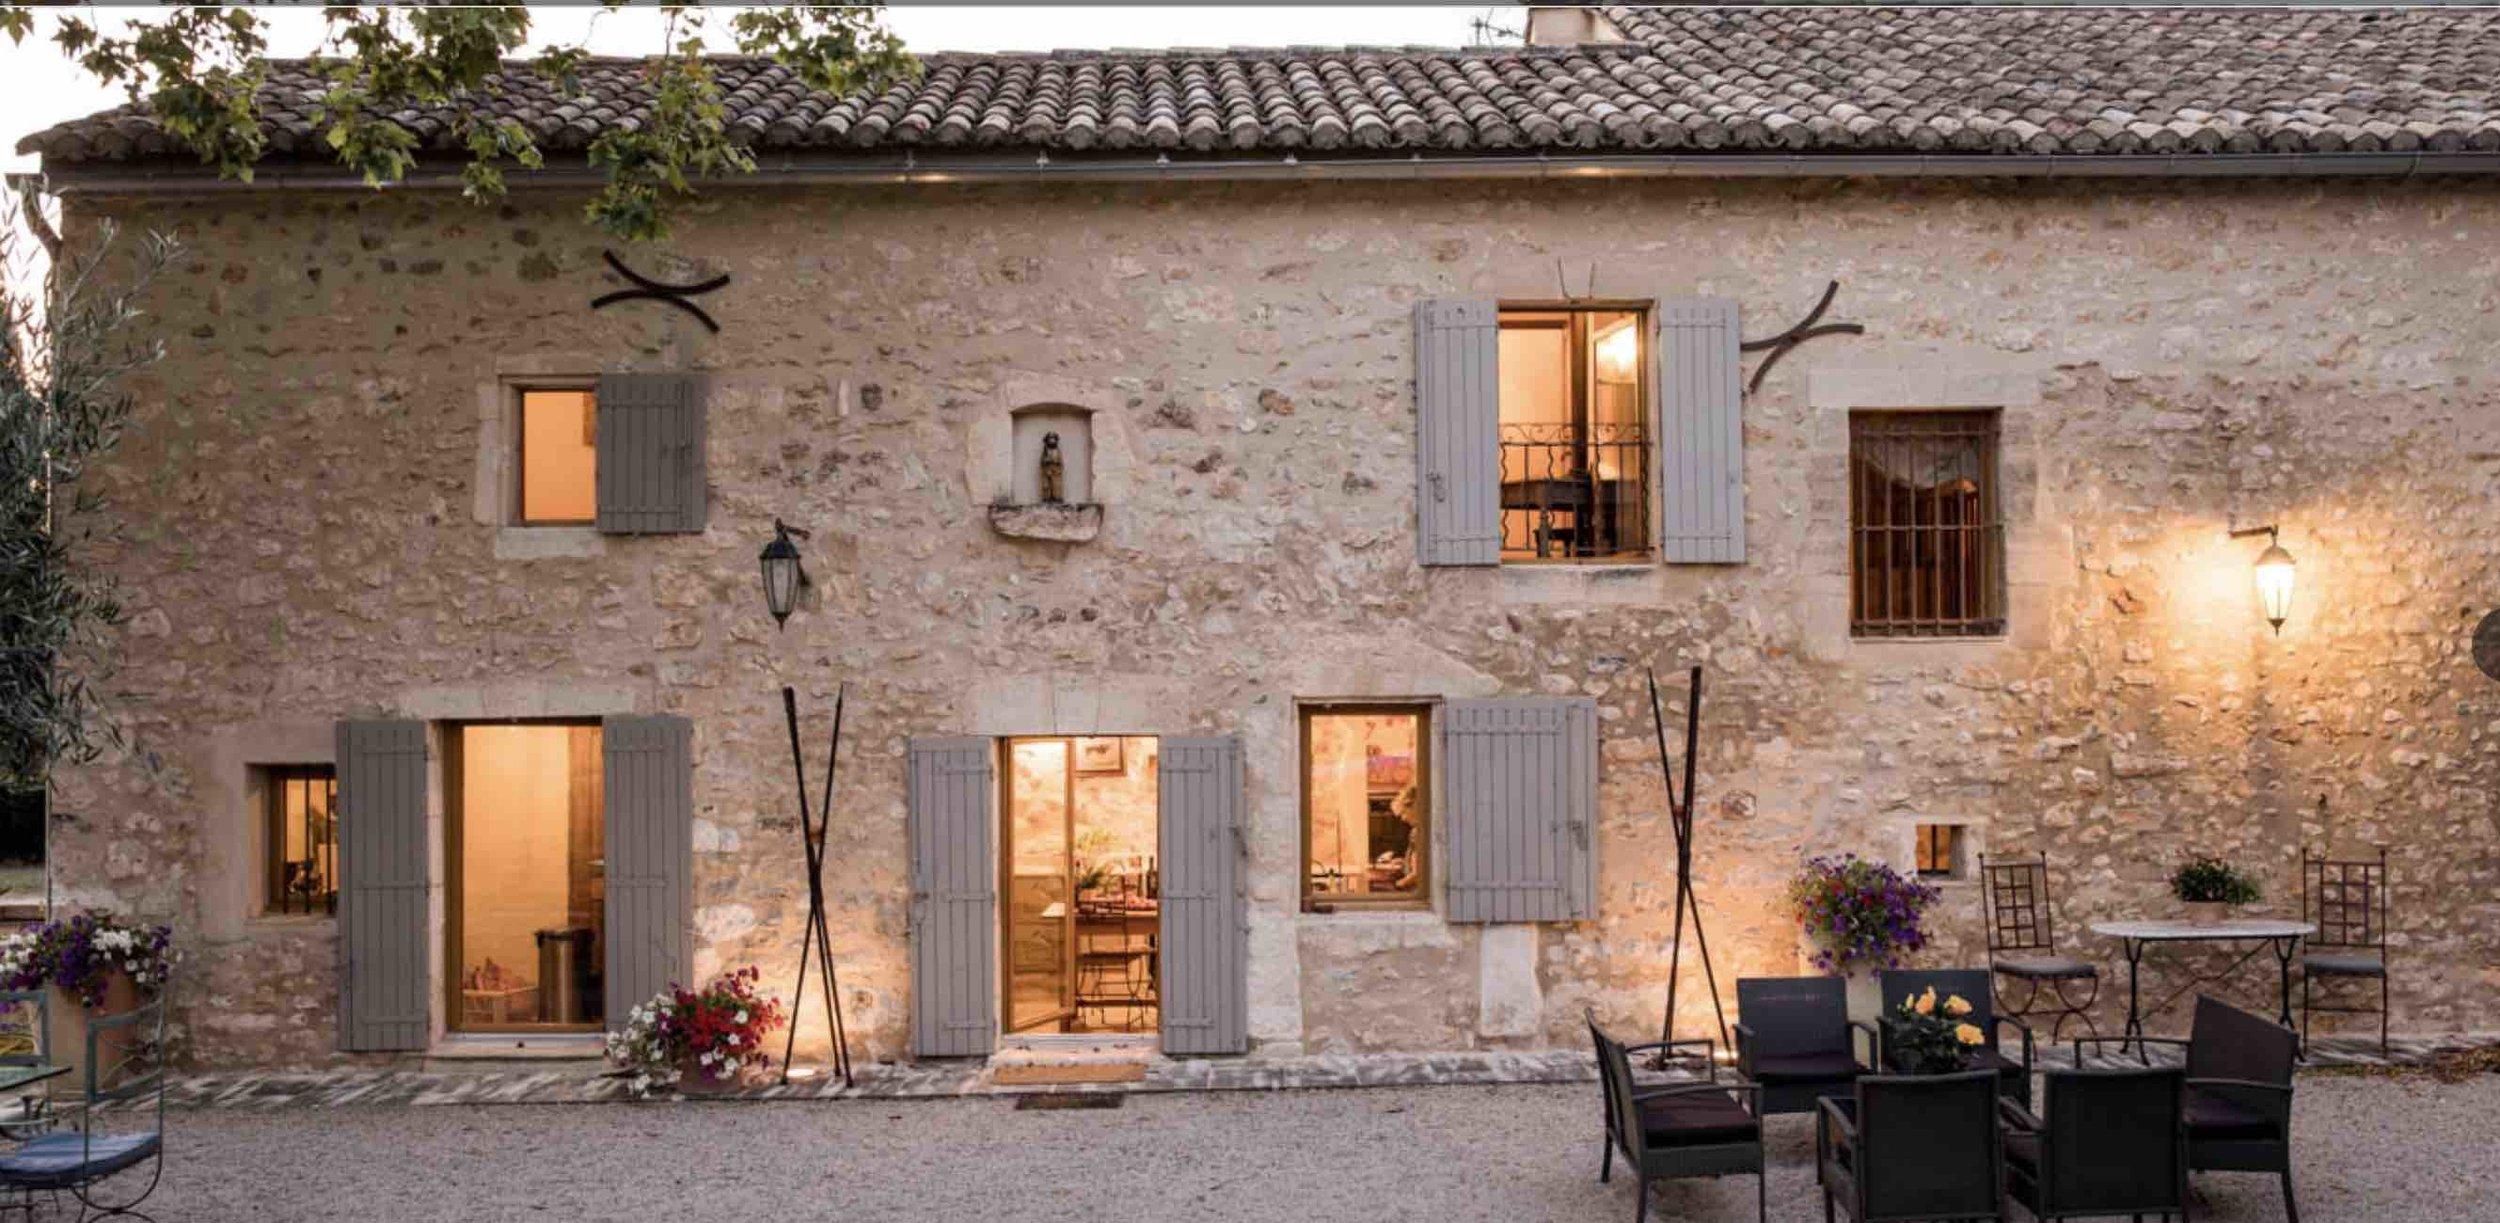 Mas des Pelerins - NG Art Creative Residency Eygalières, Provence, Southern France